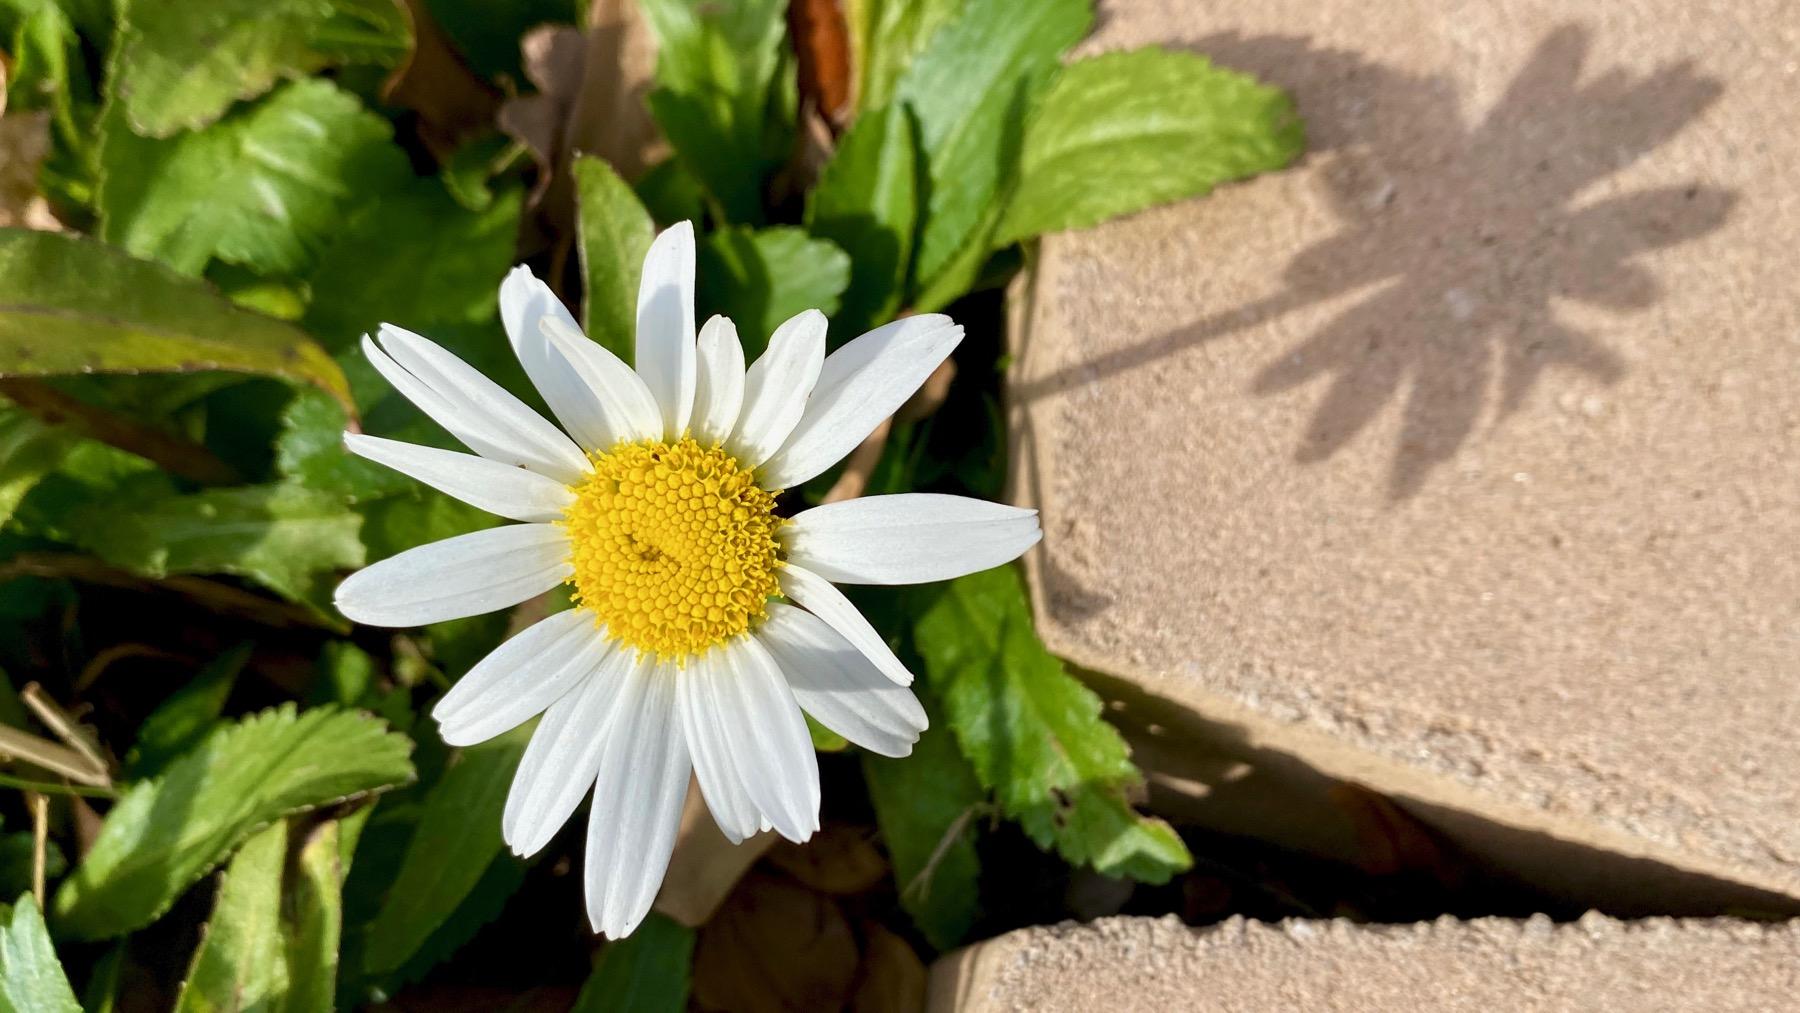 Daisy shadow